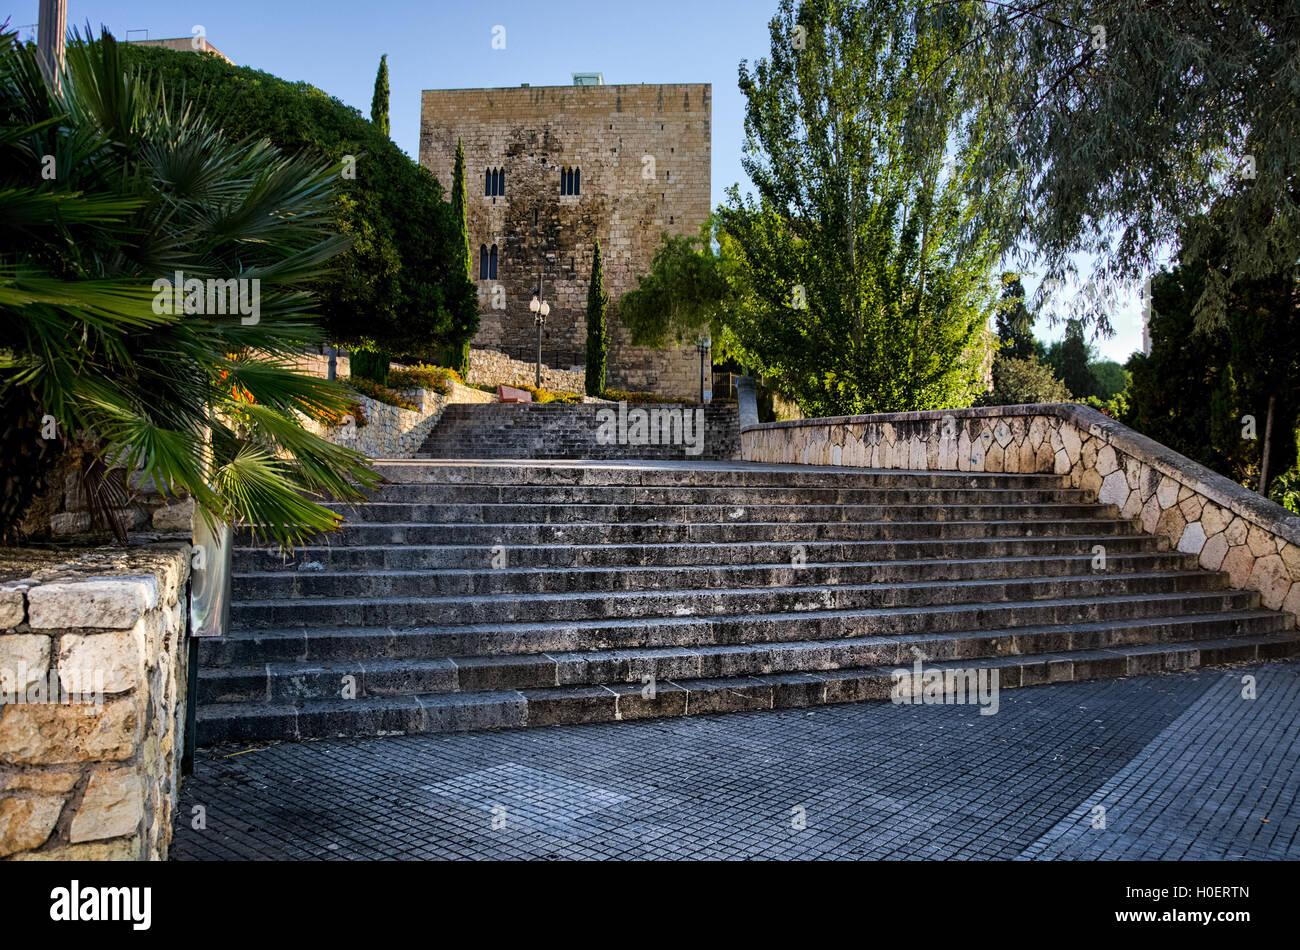 Stone steps leading to Roman tower in Tarragona, Spain - Stock Image